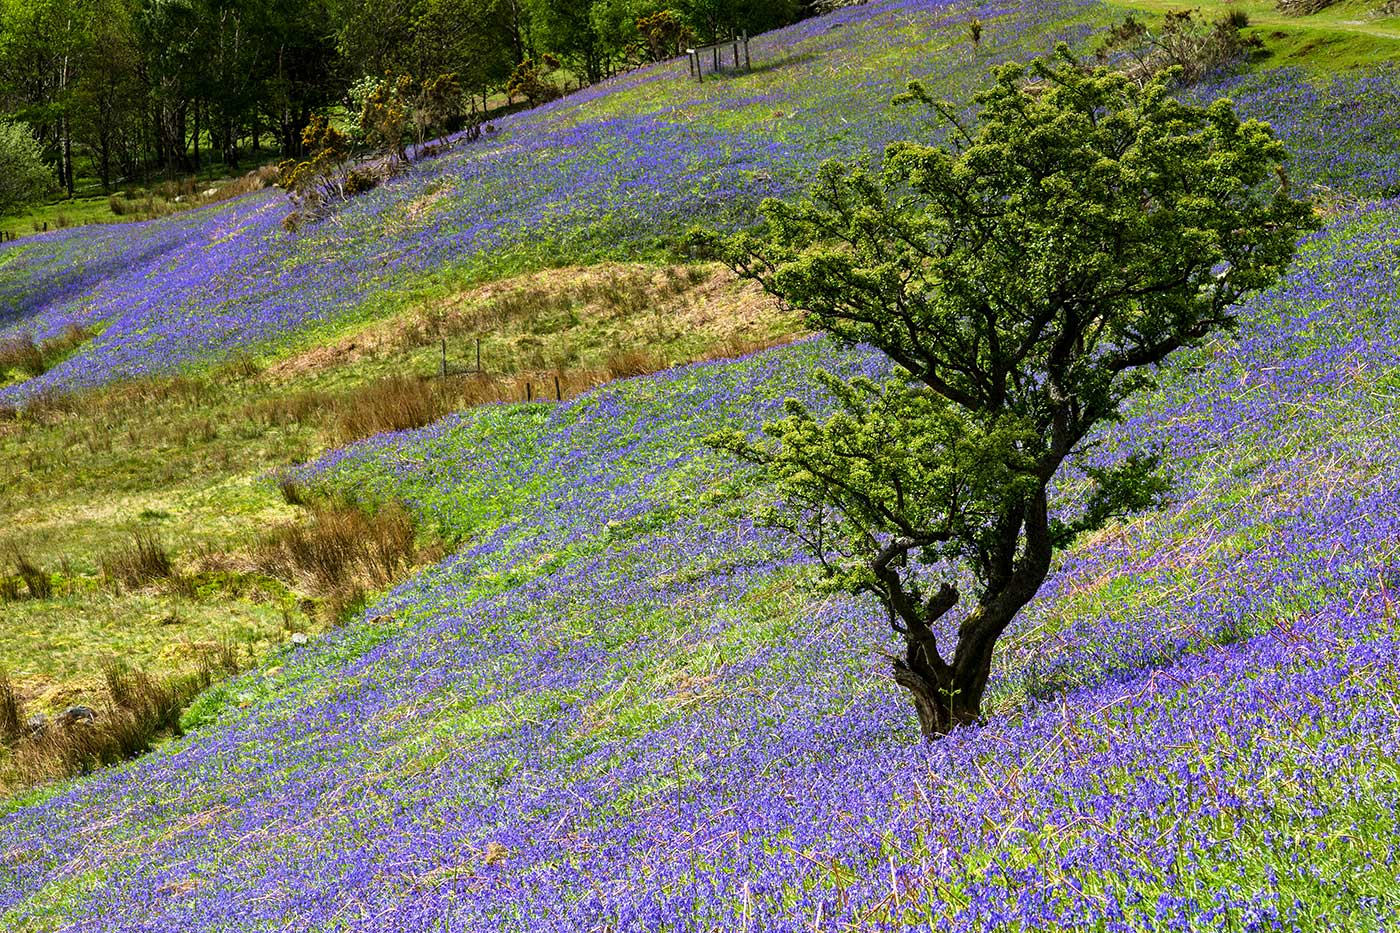 Lone-tree-amongst-the-Blue-Bells.jpg